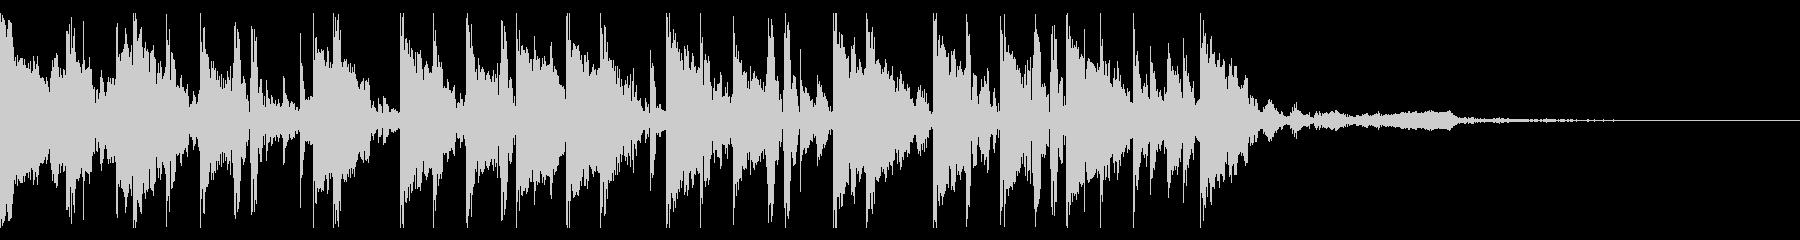 160 BPMの未再生の波形